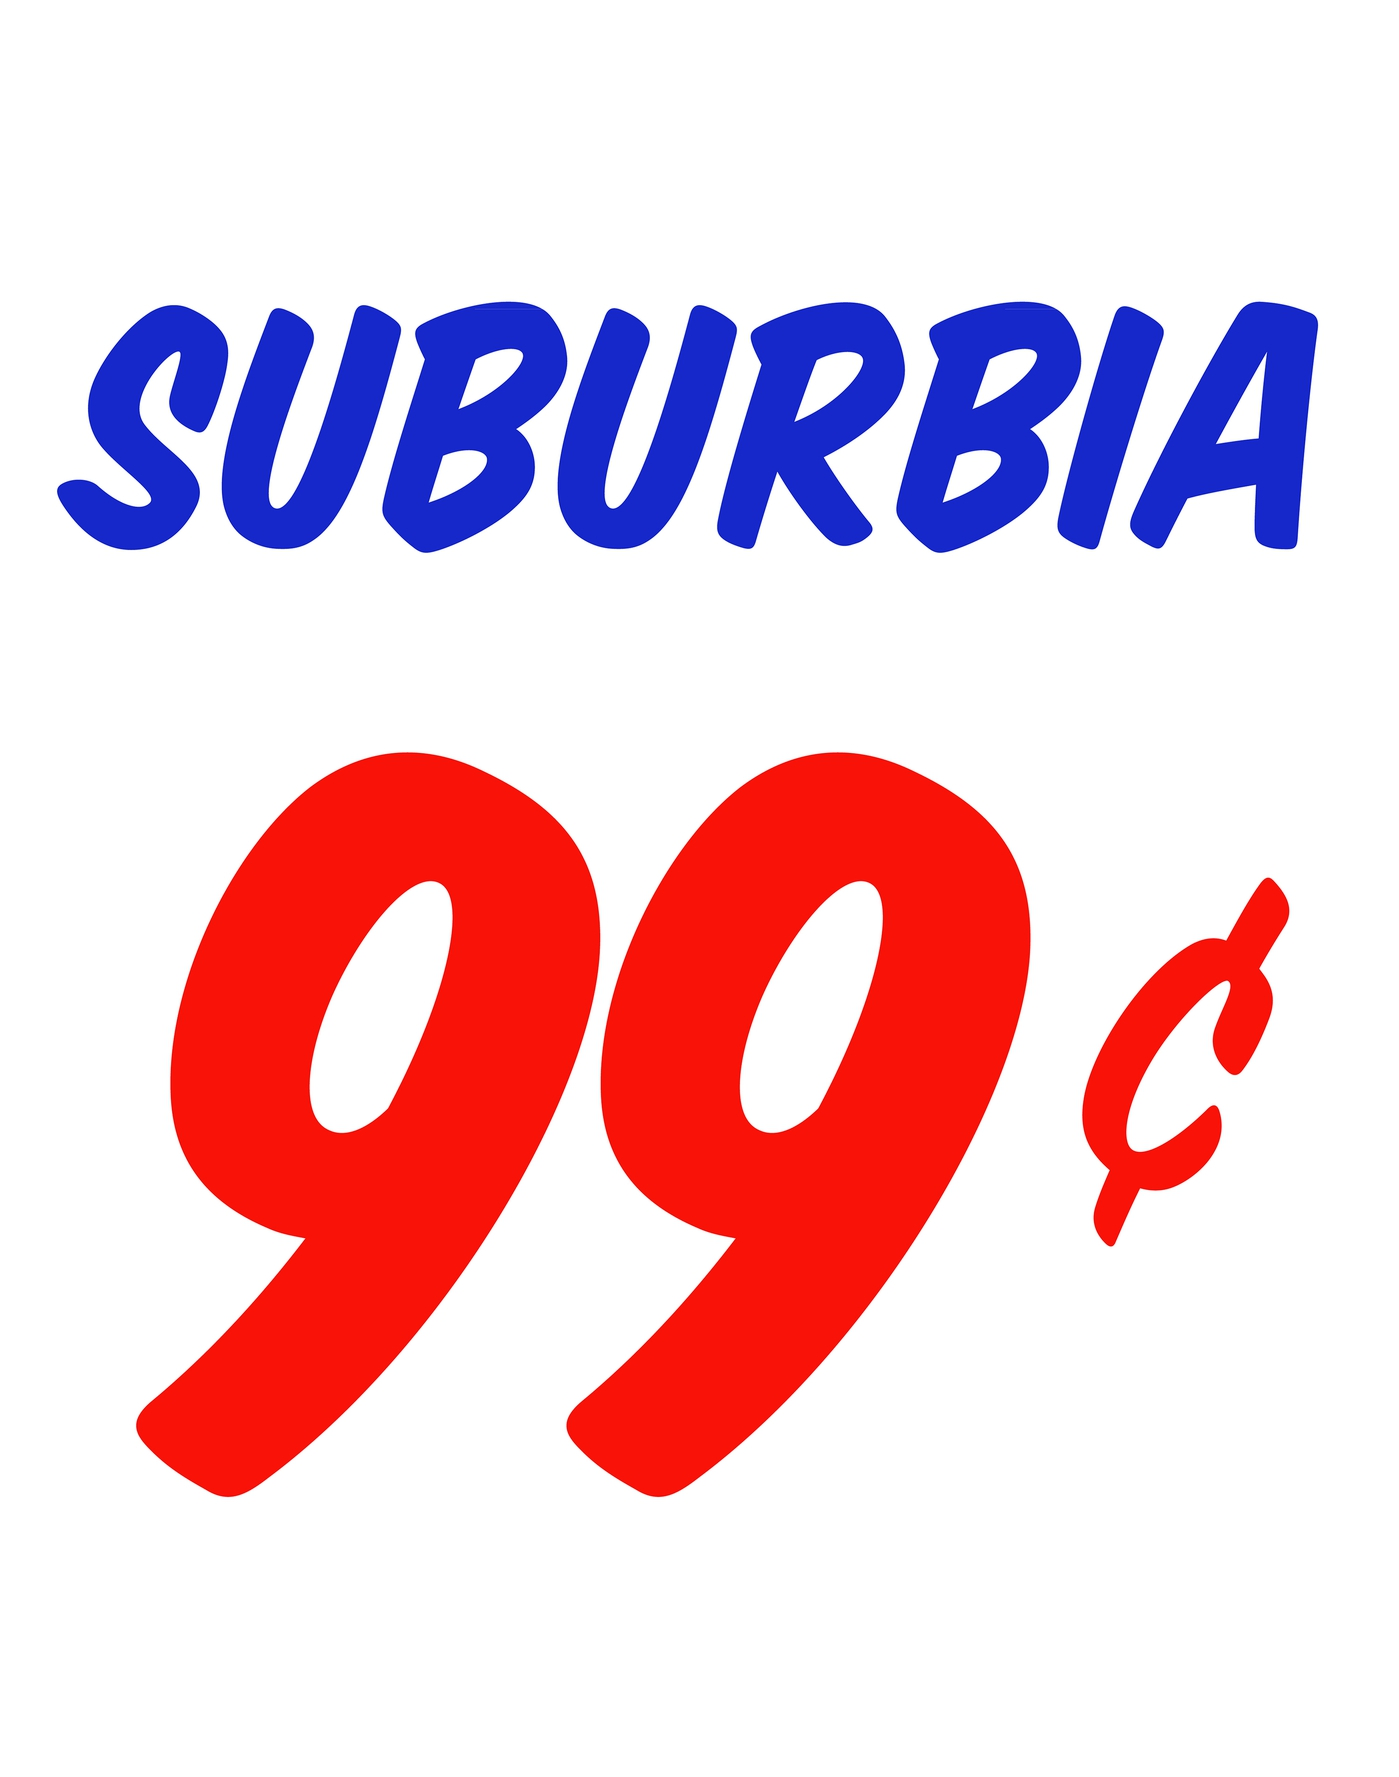 9_Suburbia